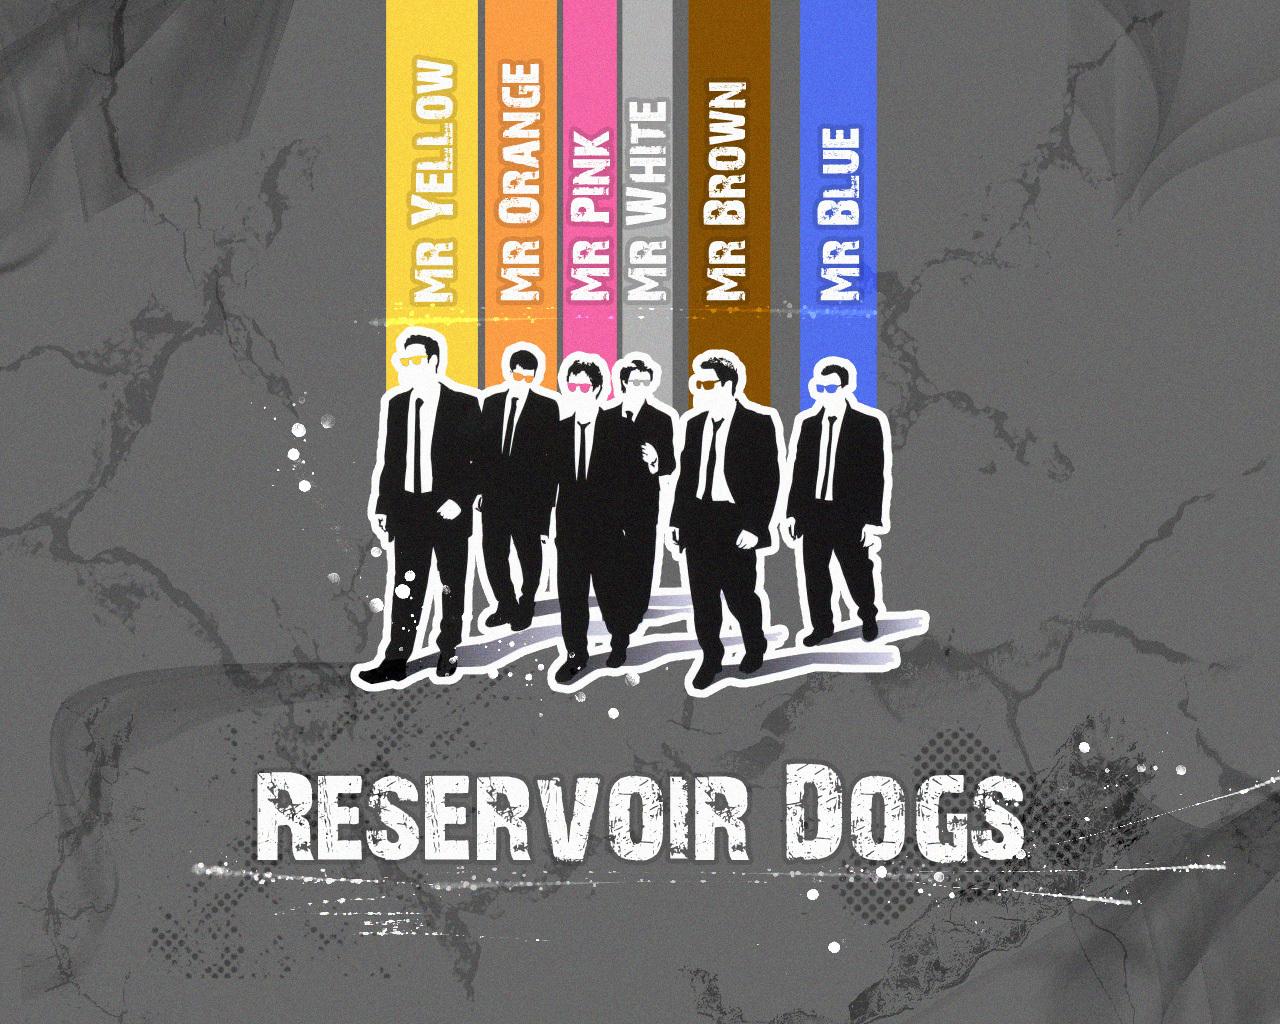 Reservoir Dogs Cast Names